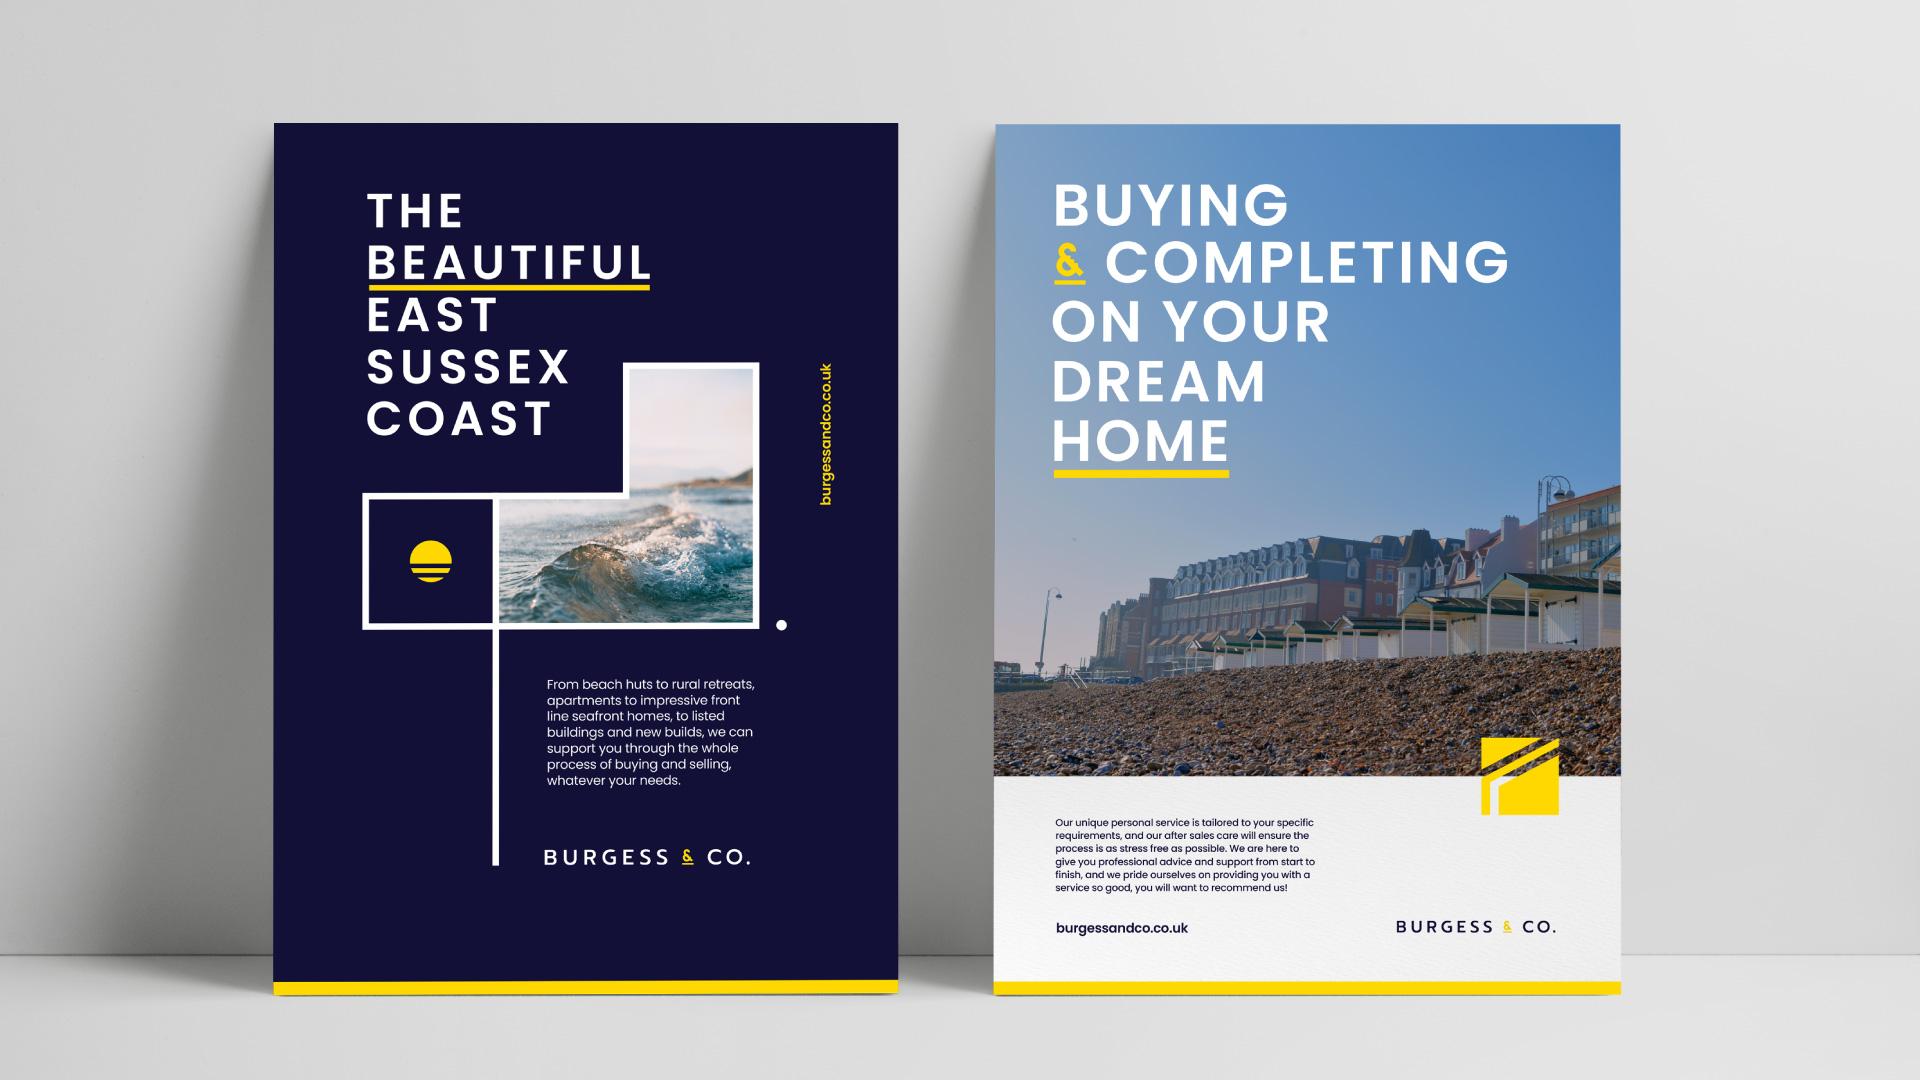 Burgess&Co brand identity poster designs.